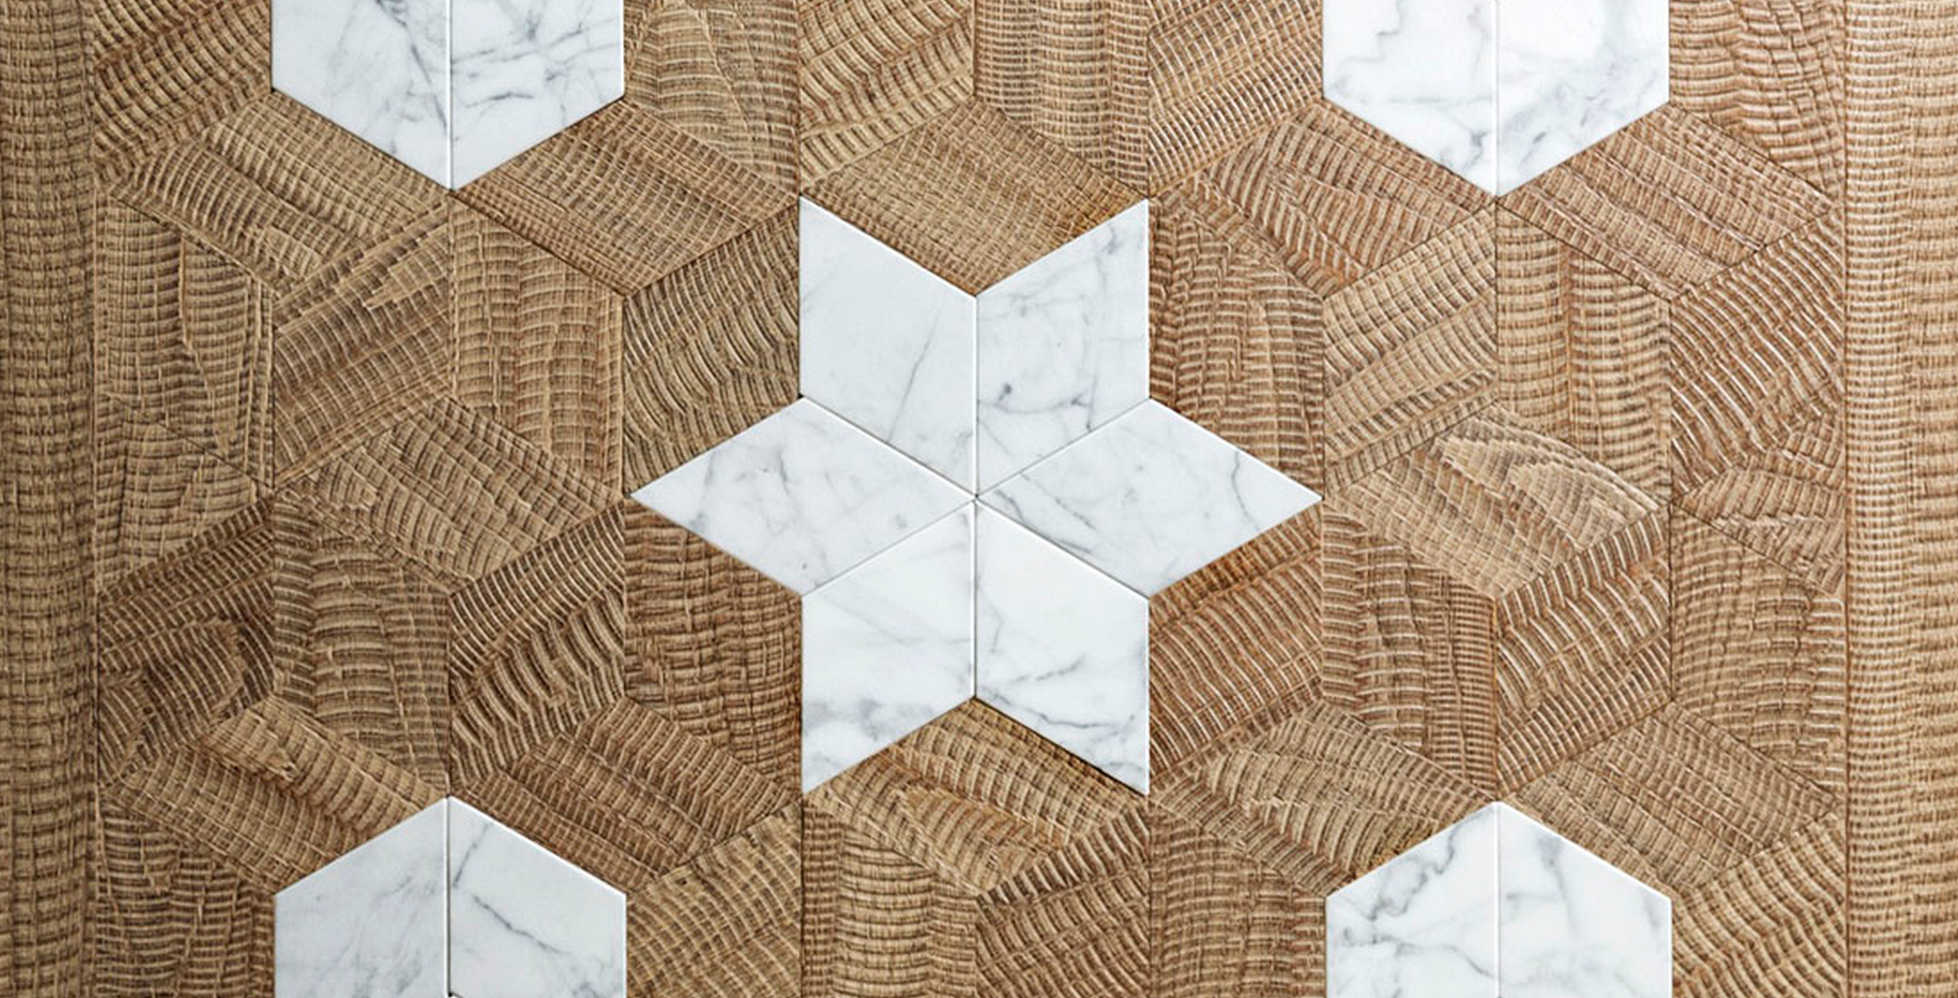 Dedalo stone marble and wood feature 2 - Masha Shapiro Agency.png